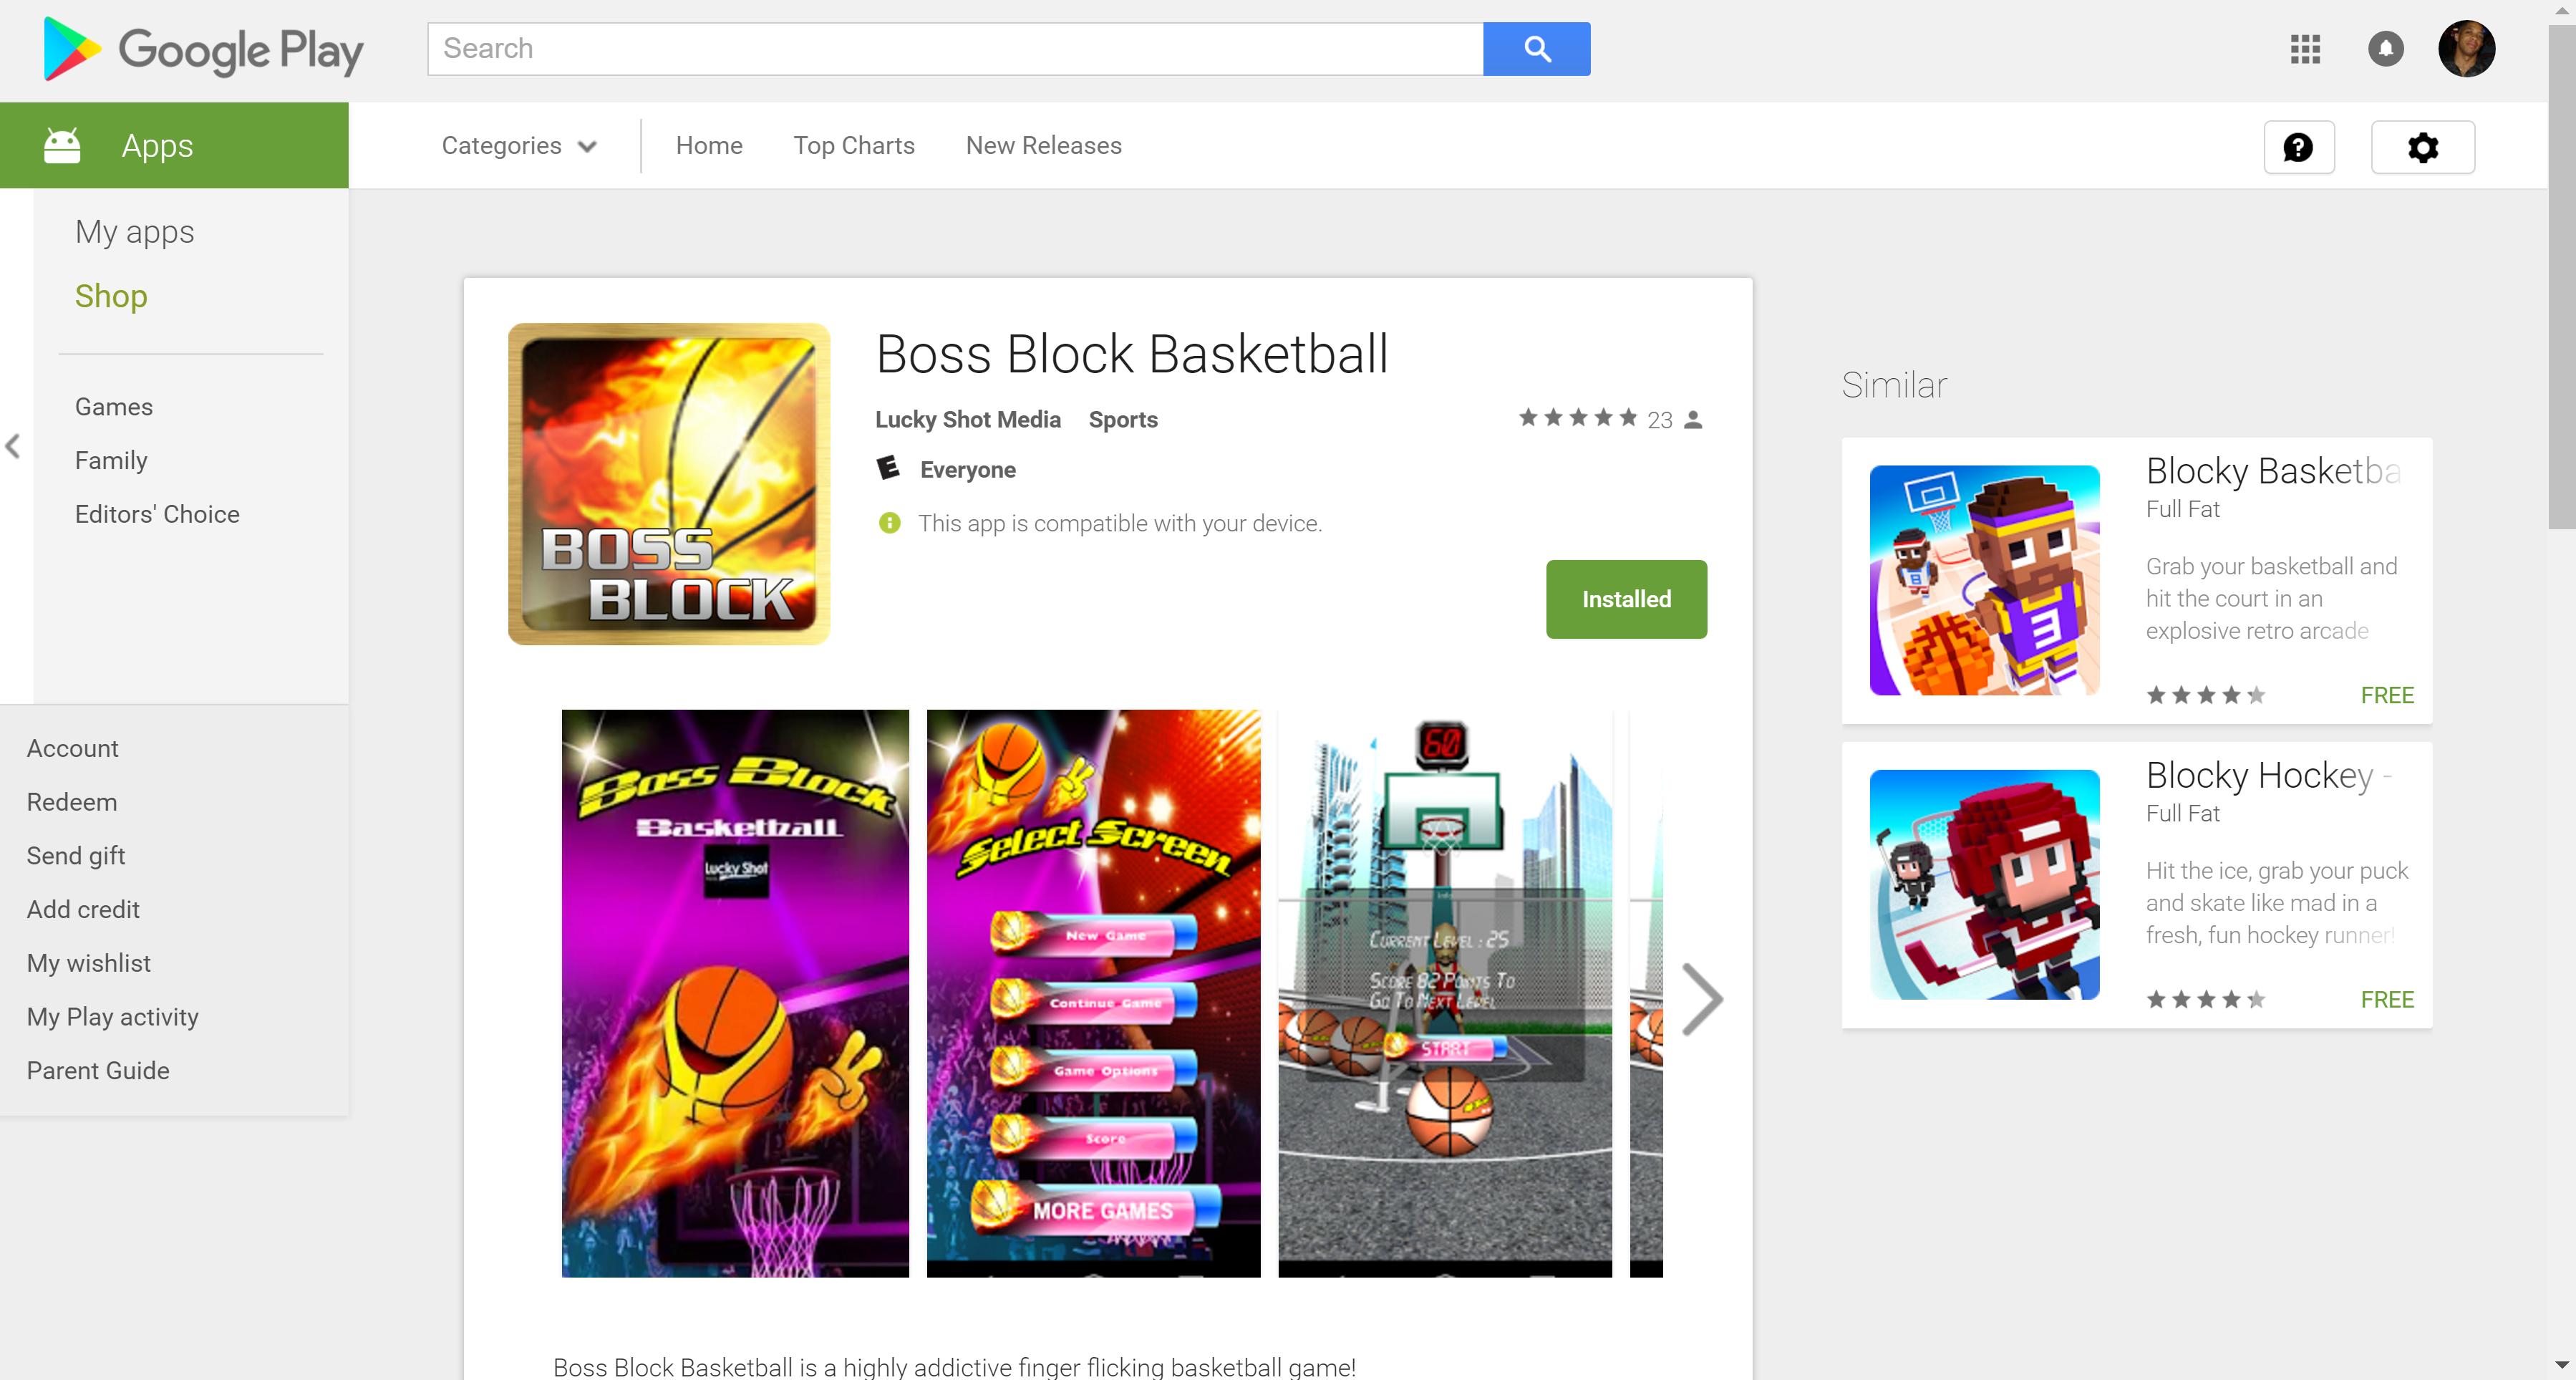 Boss Block Basketball